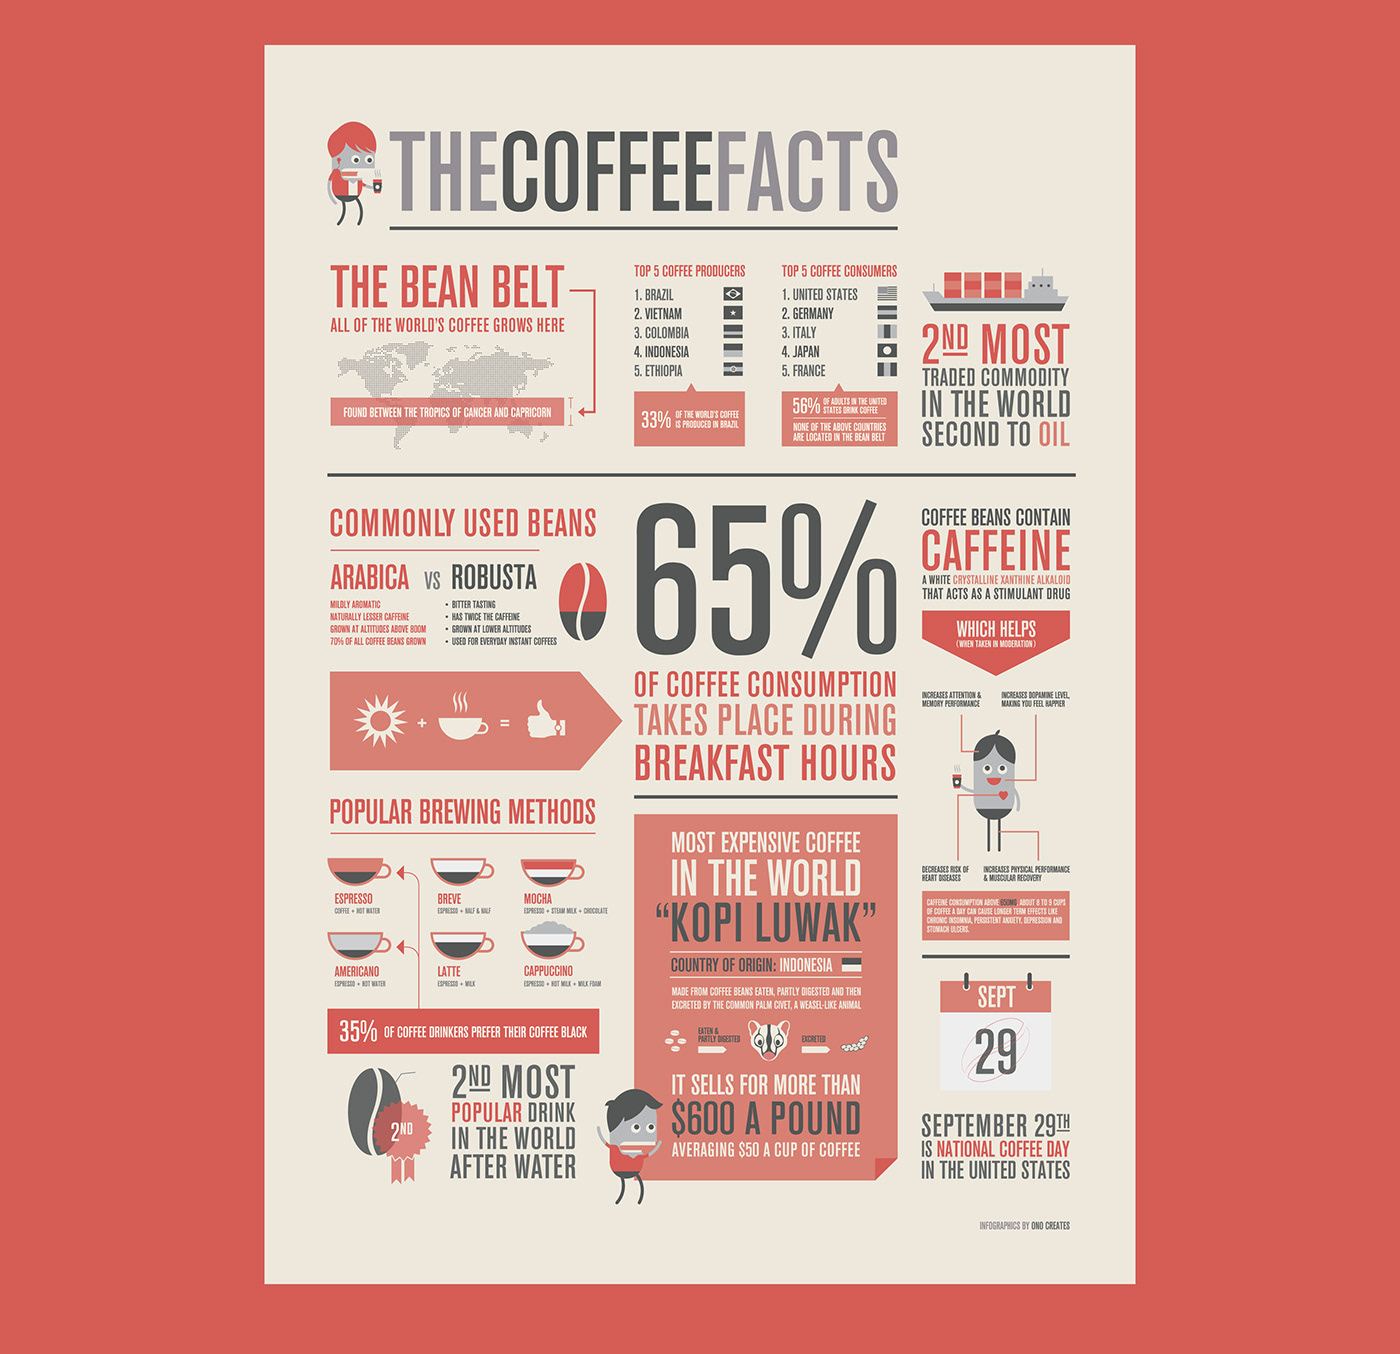 infographics Coffee starbucks coffee beans caffeine information graphics Medness Ahmericarnation illustrations info-graphics